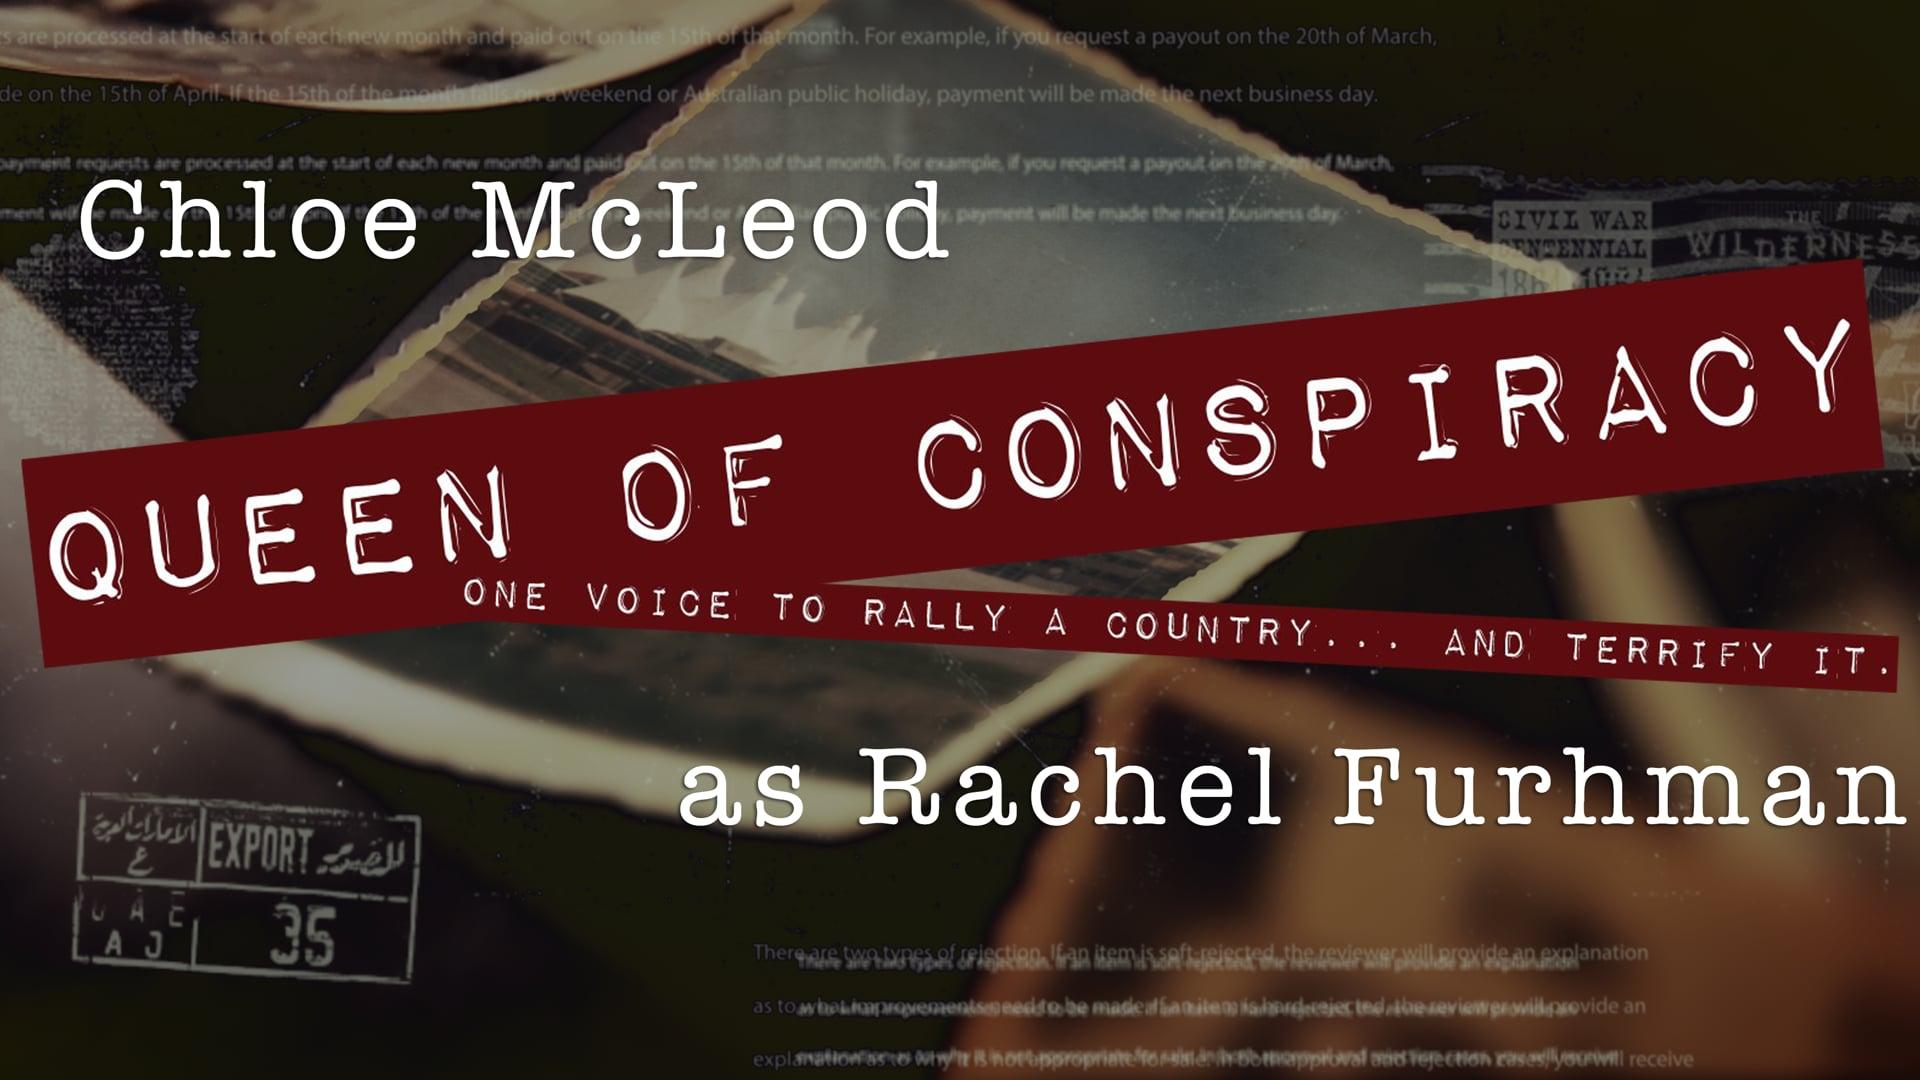 Chloe McLeod as Rachel Furhman